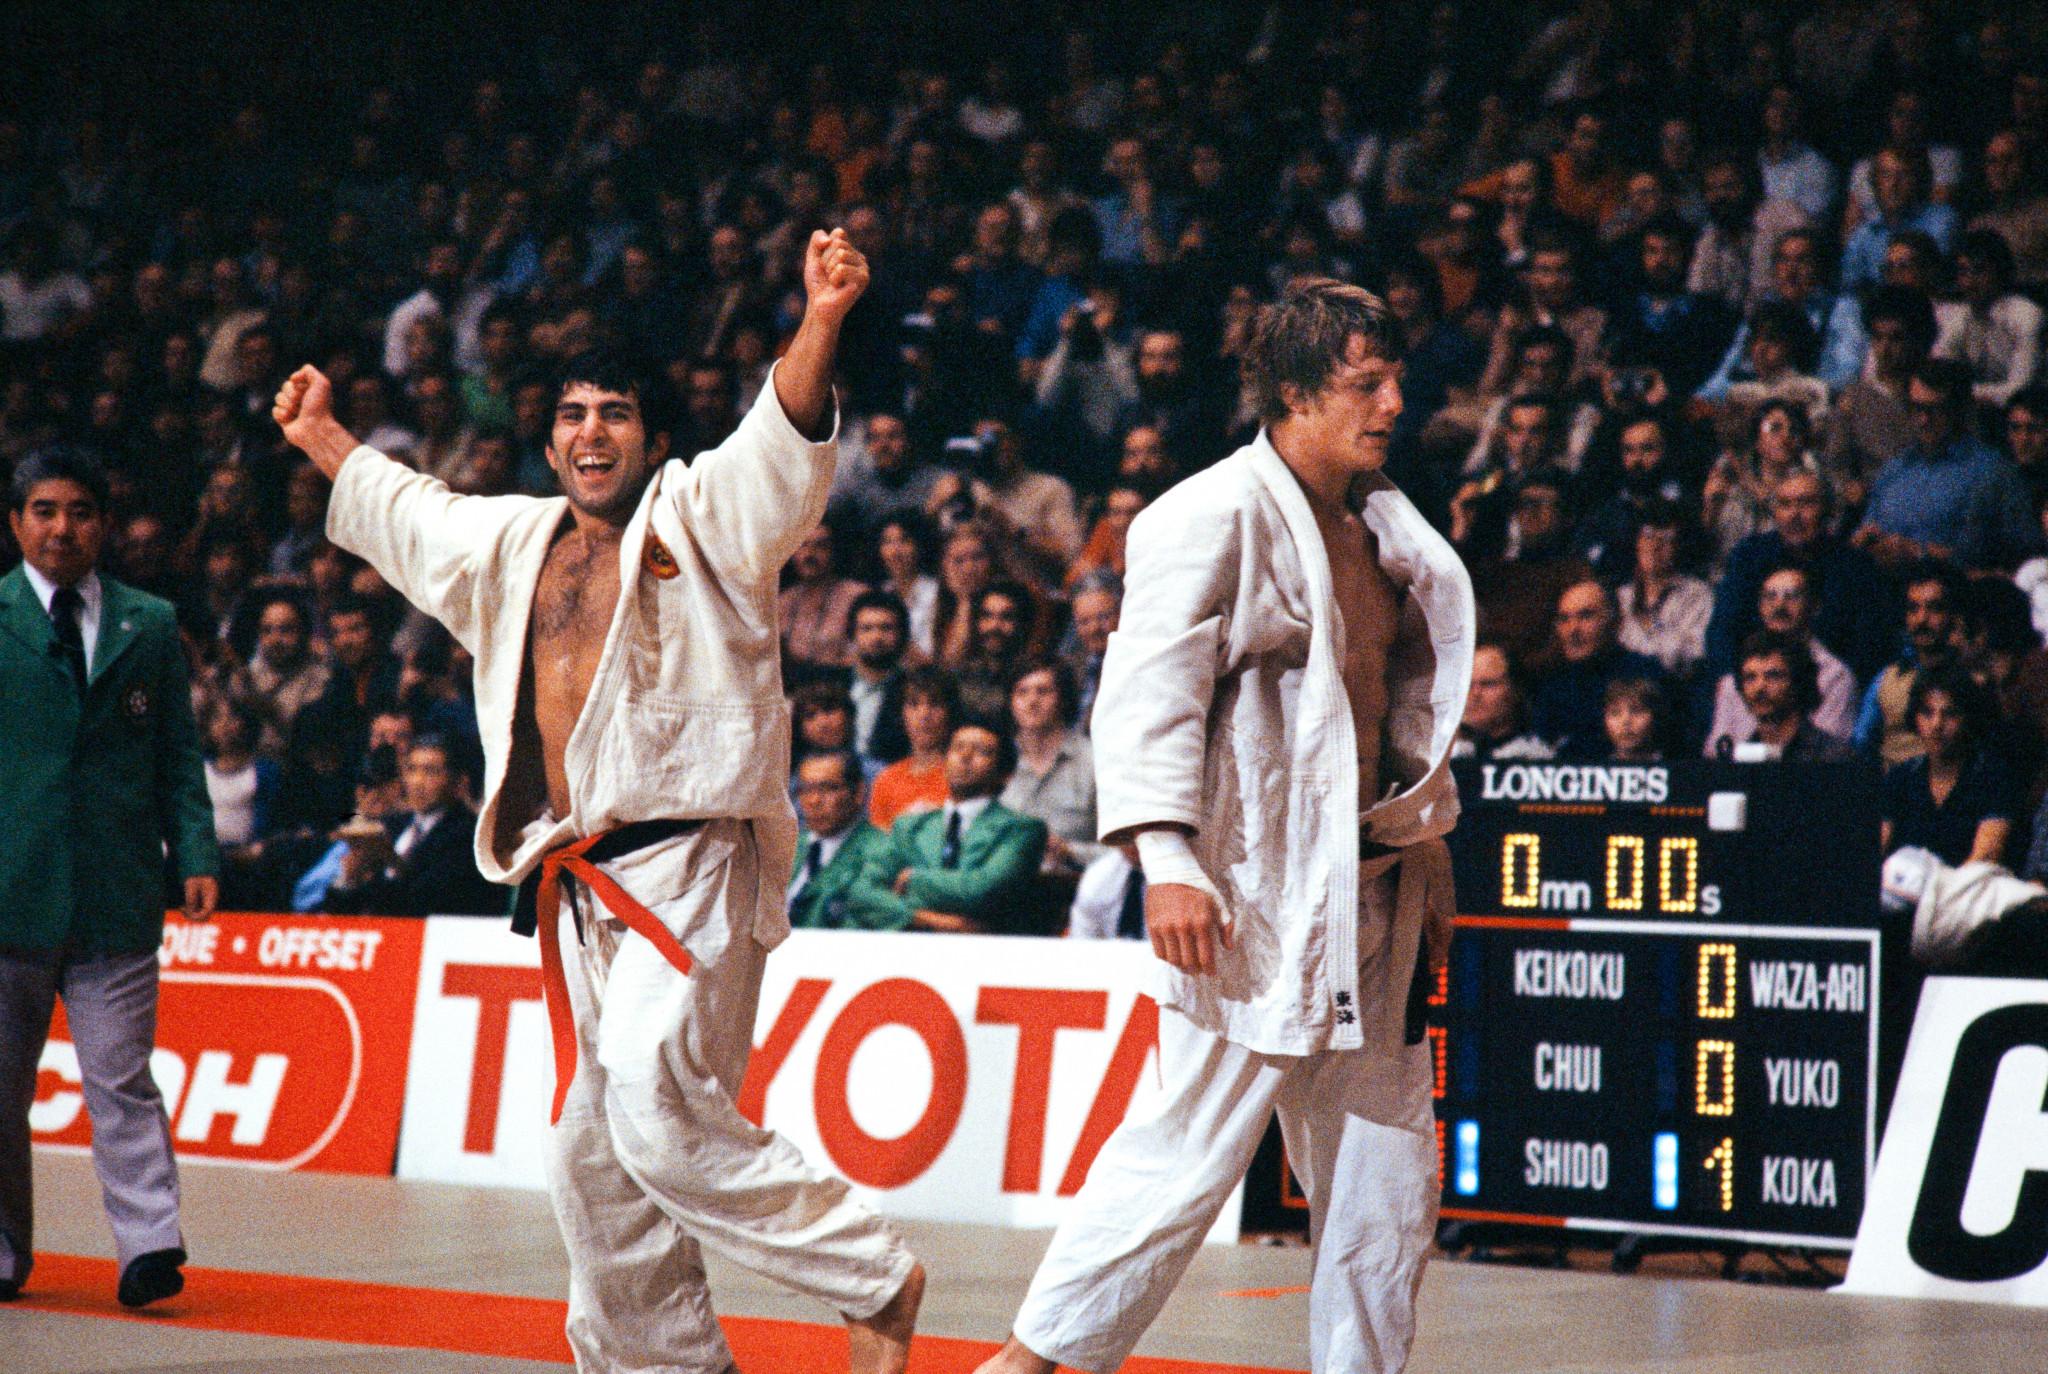 Belgium's Robert Van de Walle reacts (R) after his defeat against Georgian Tengiz Khubuluri(L) during the Judo World Championships in Paris, on December 1979 ©Getty Images